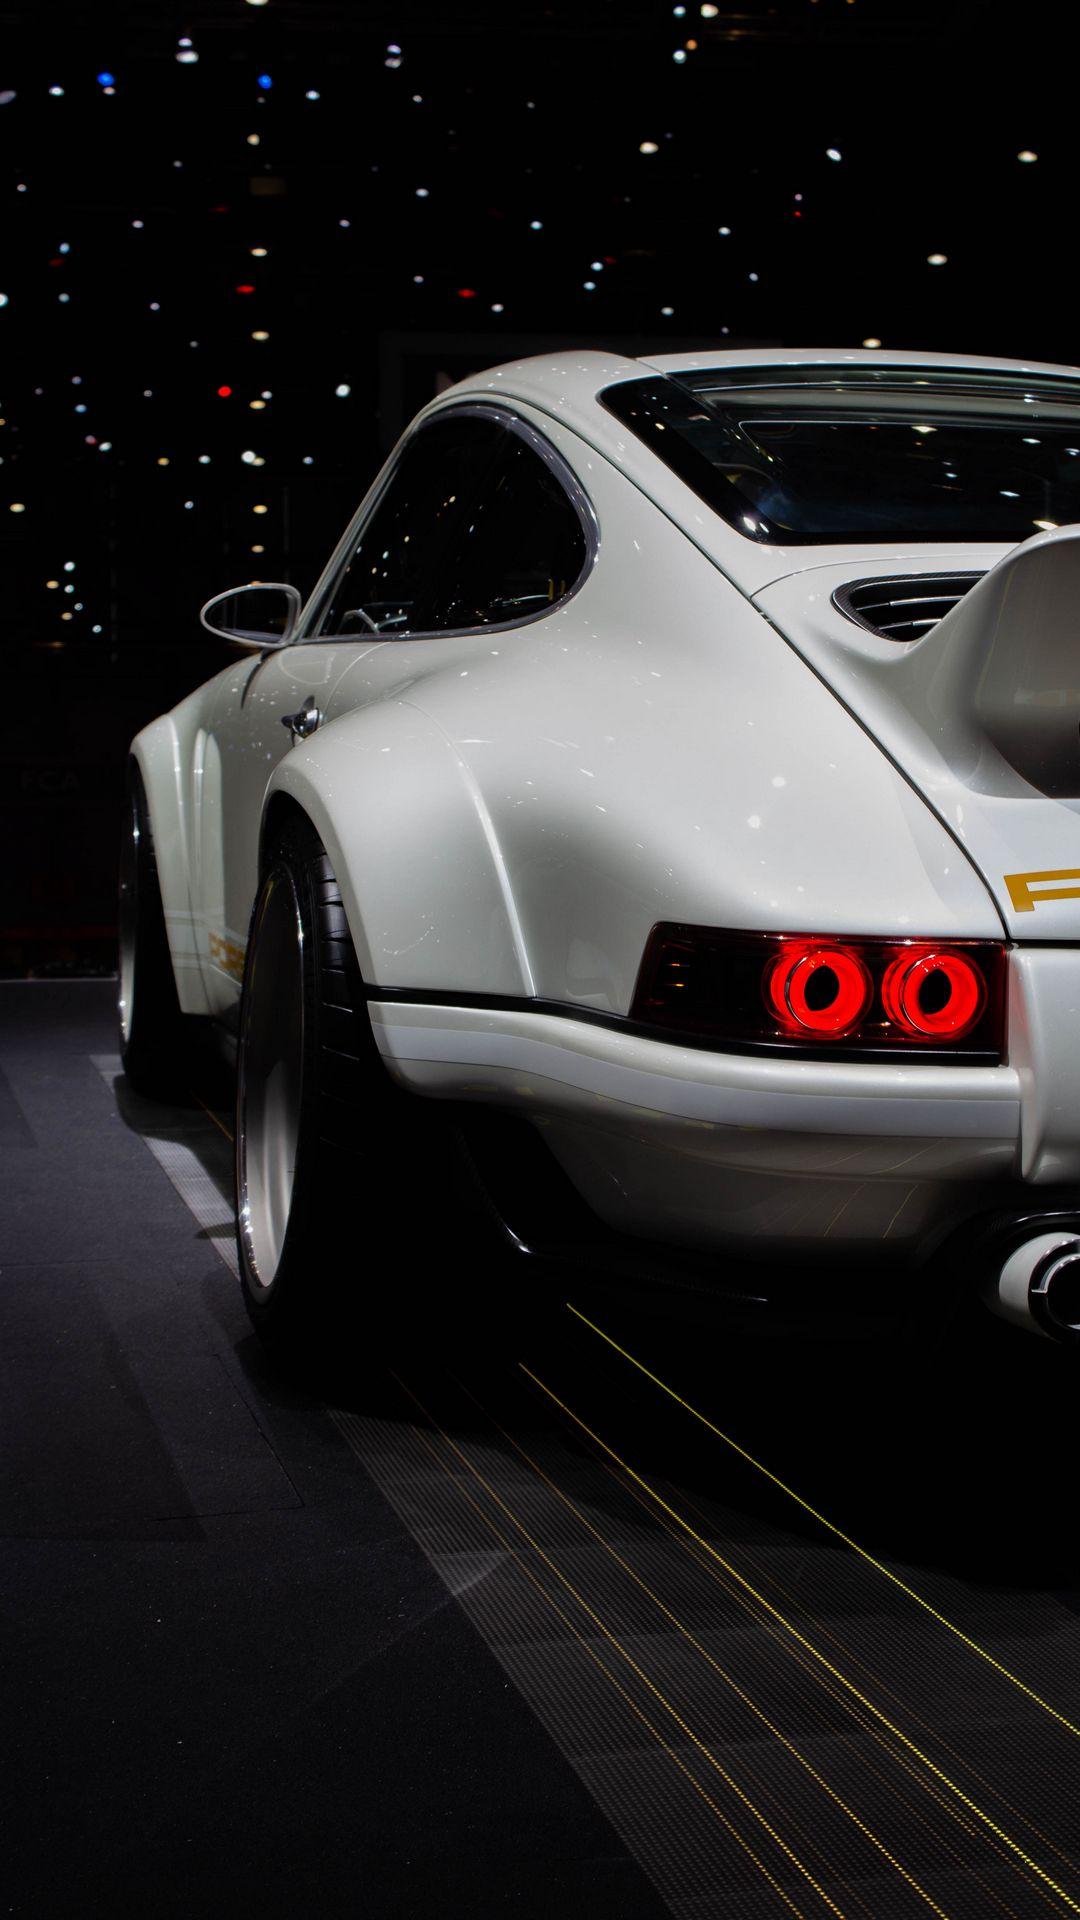 Porsche 911 Retro 4K HD Wallpapers Free Download